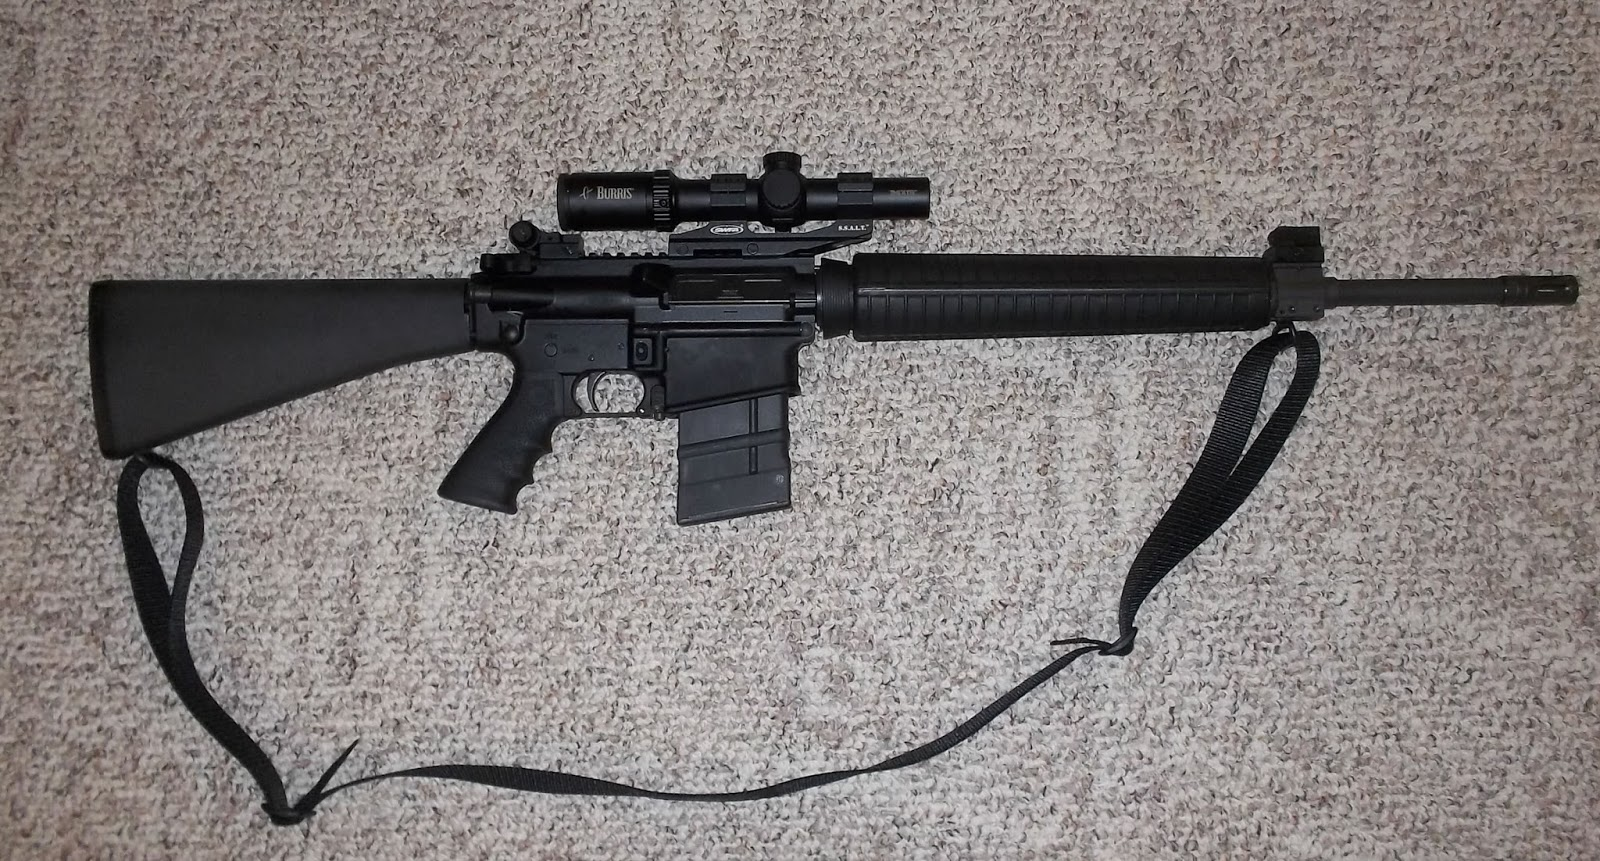 Skillful Manufacture Collectibles Militaria Sks Rear Sight Set Simonov Rifle.the Original Soviet Union